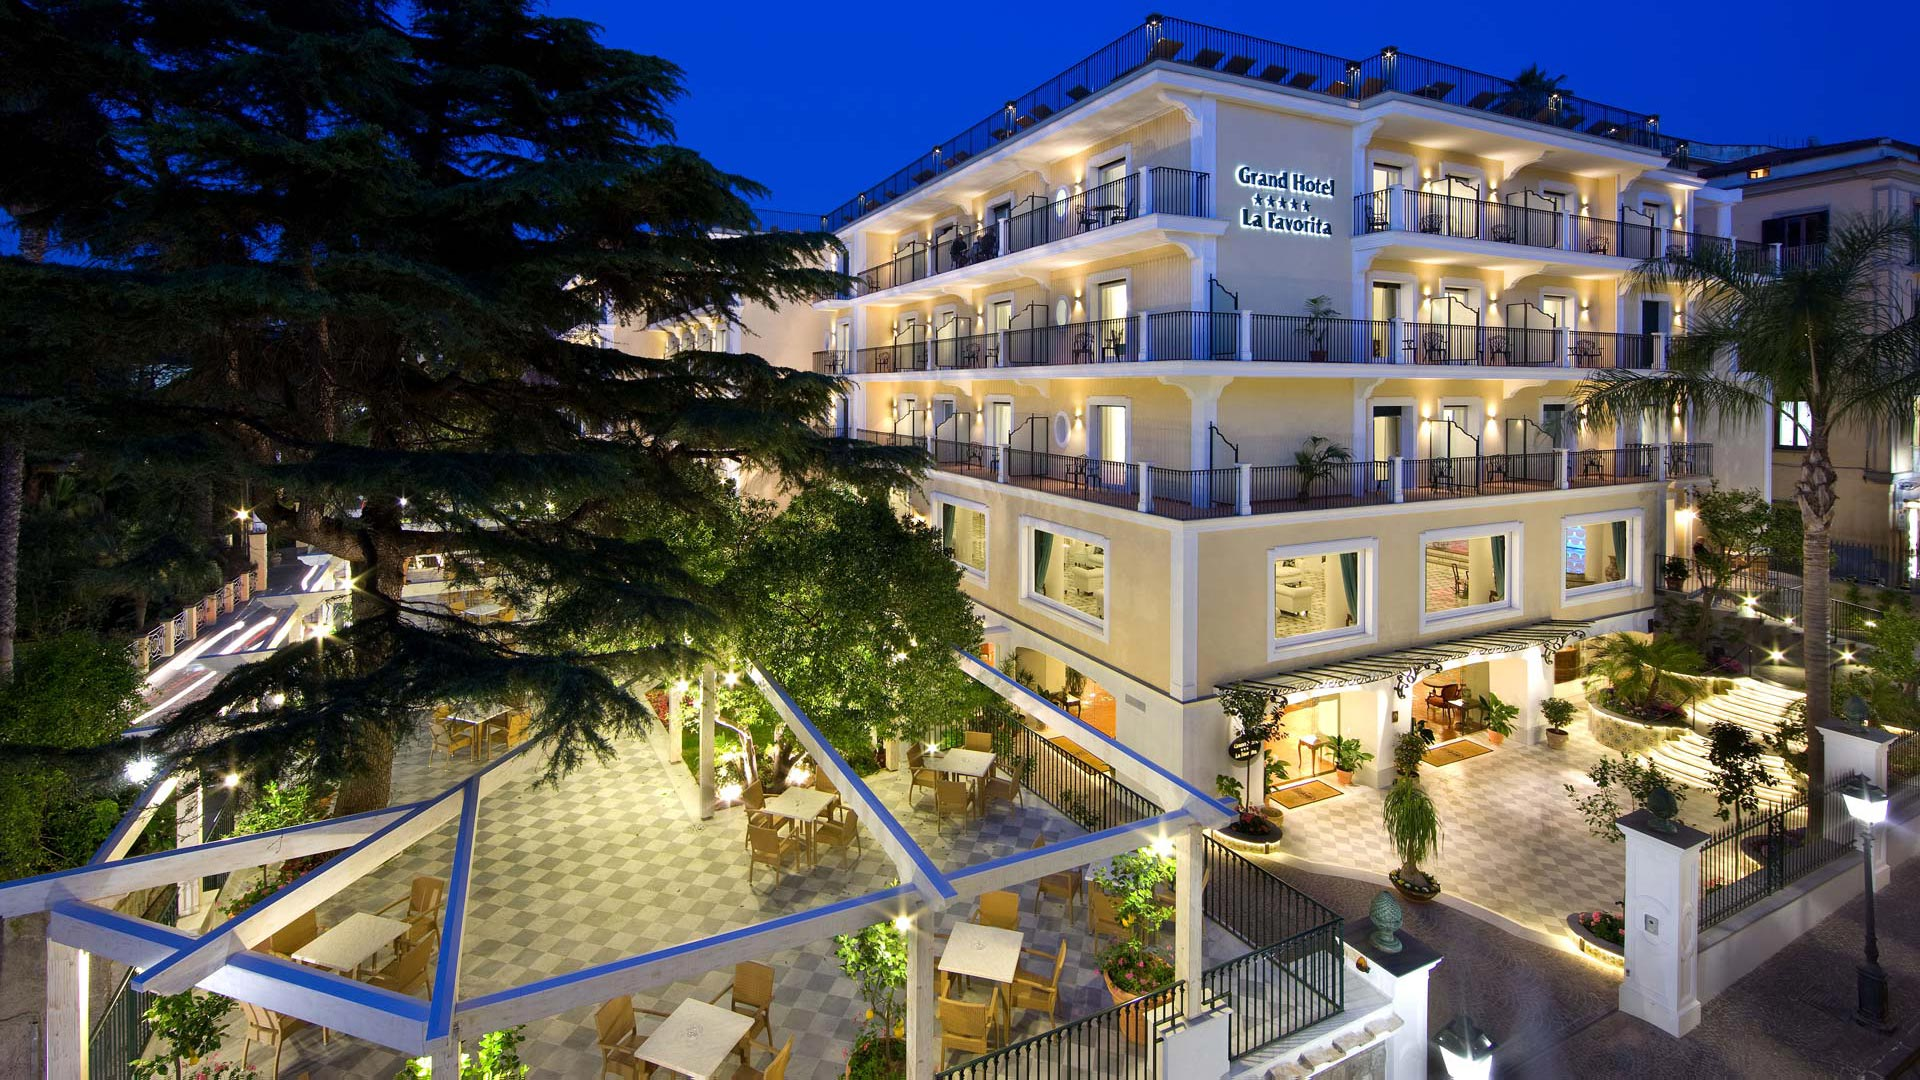 Grand Villa Hotel Rates